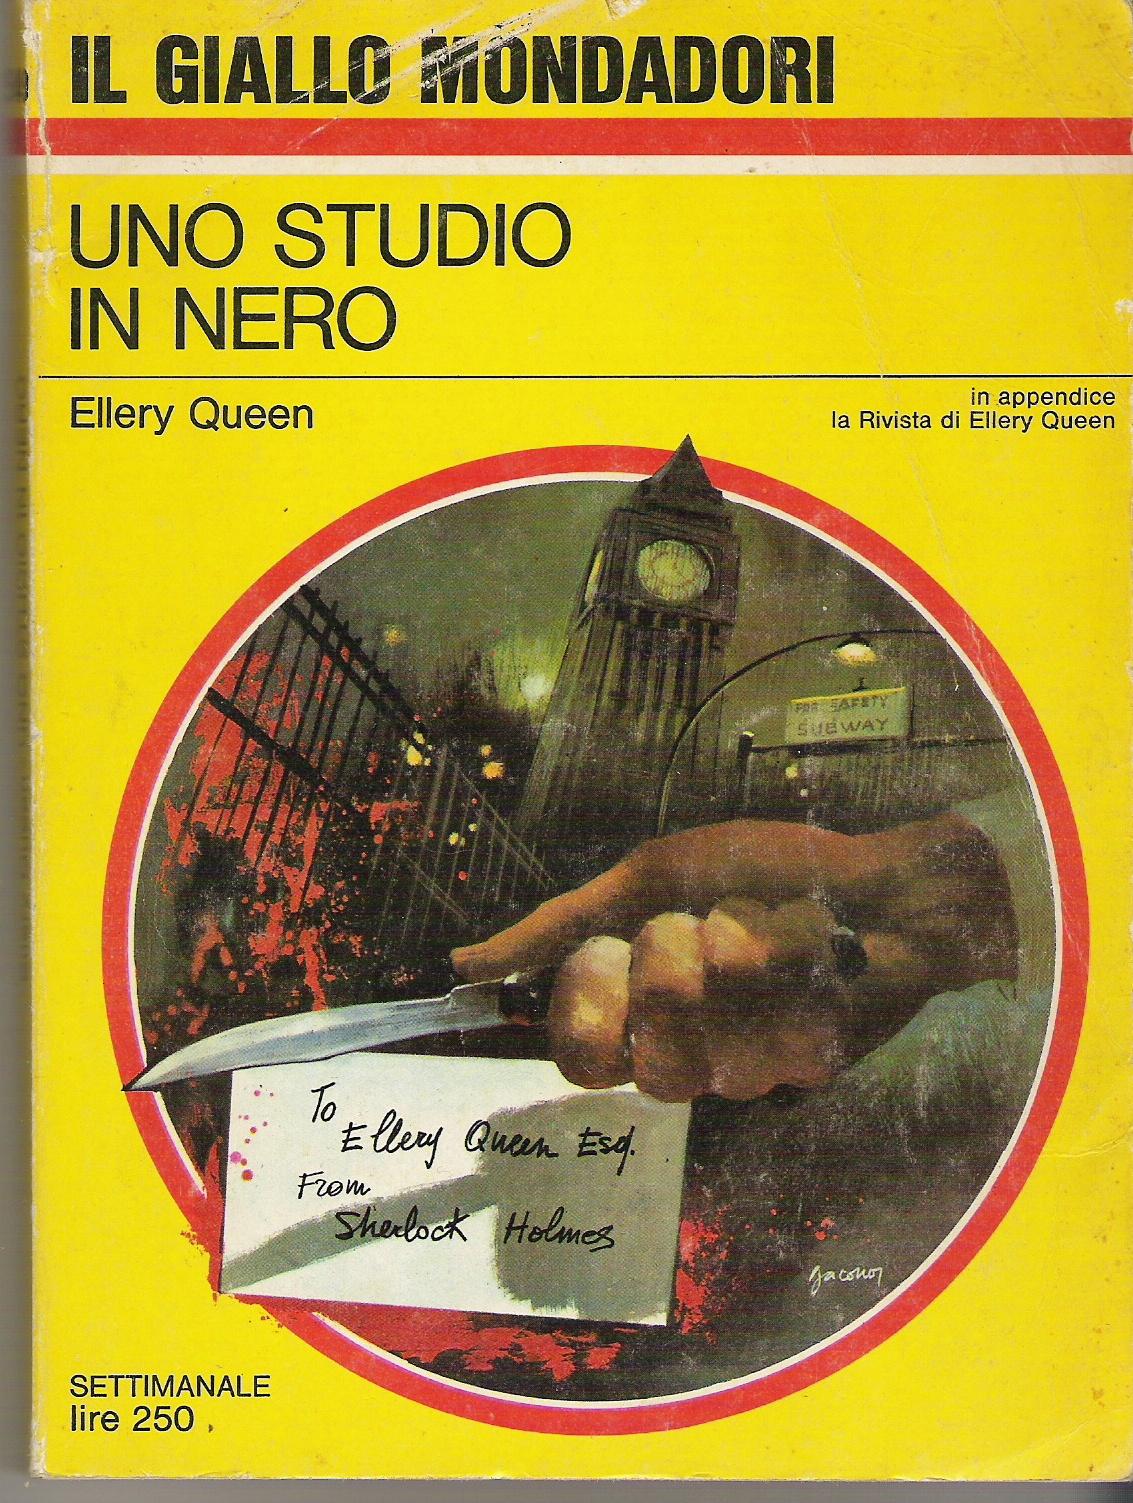 Uno Studio In Nero uno studio in nero - ellery queen - anobii